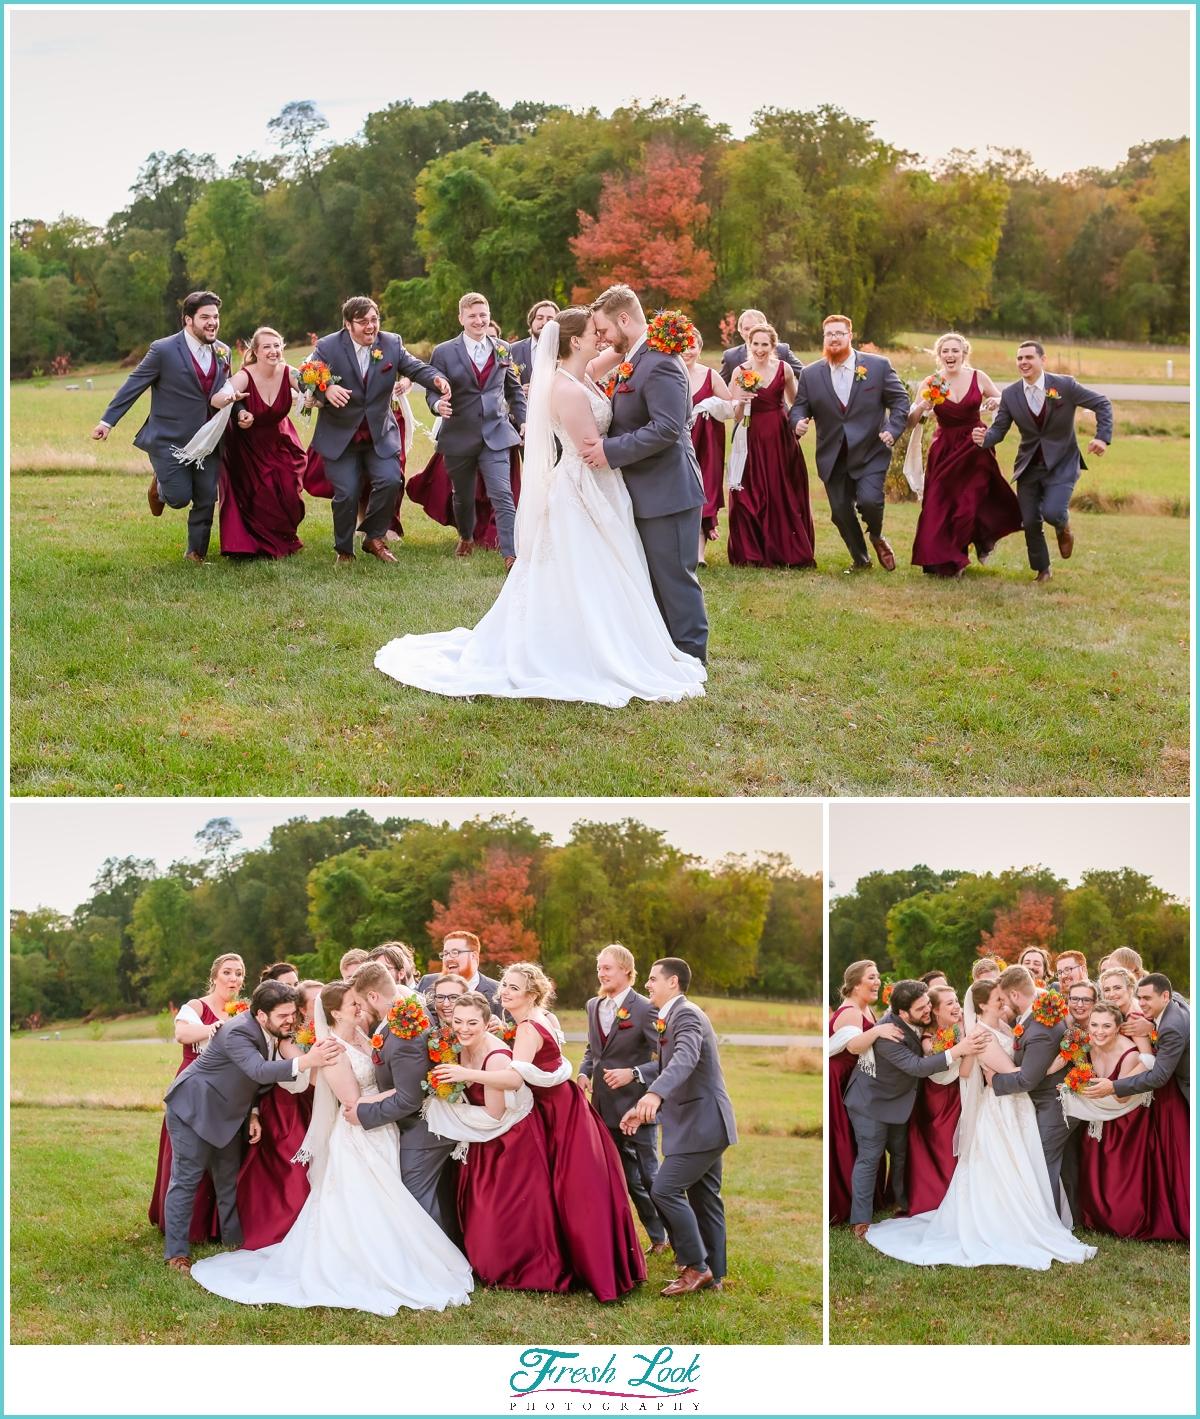 funny bridal party photo ideas